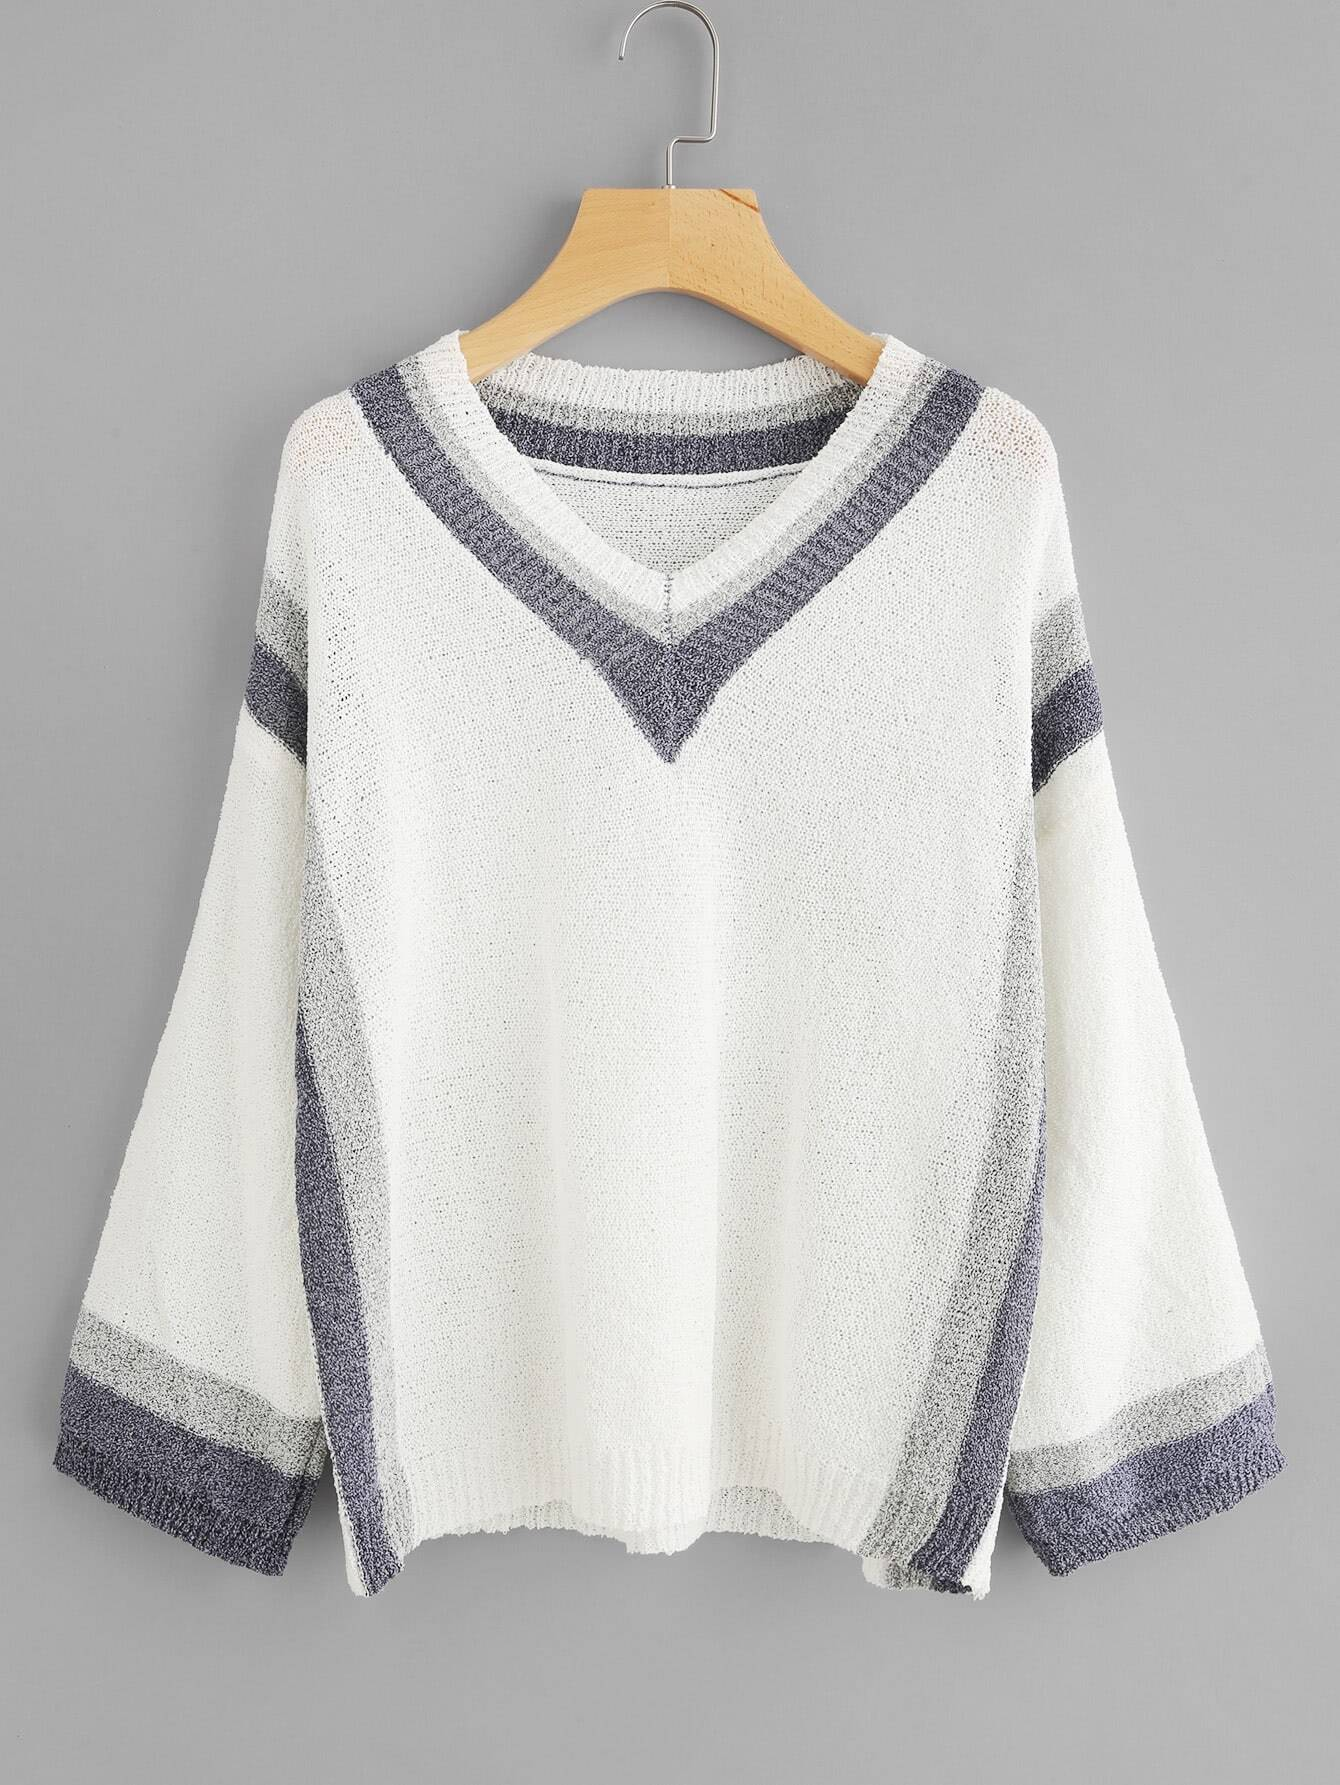 Contrast Striped Hem Sweater sweater170905403